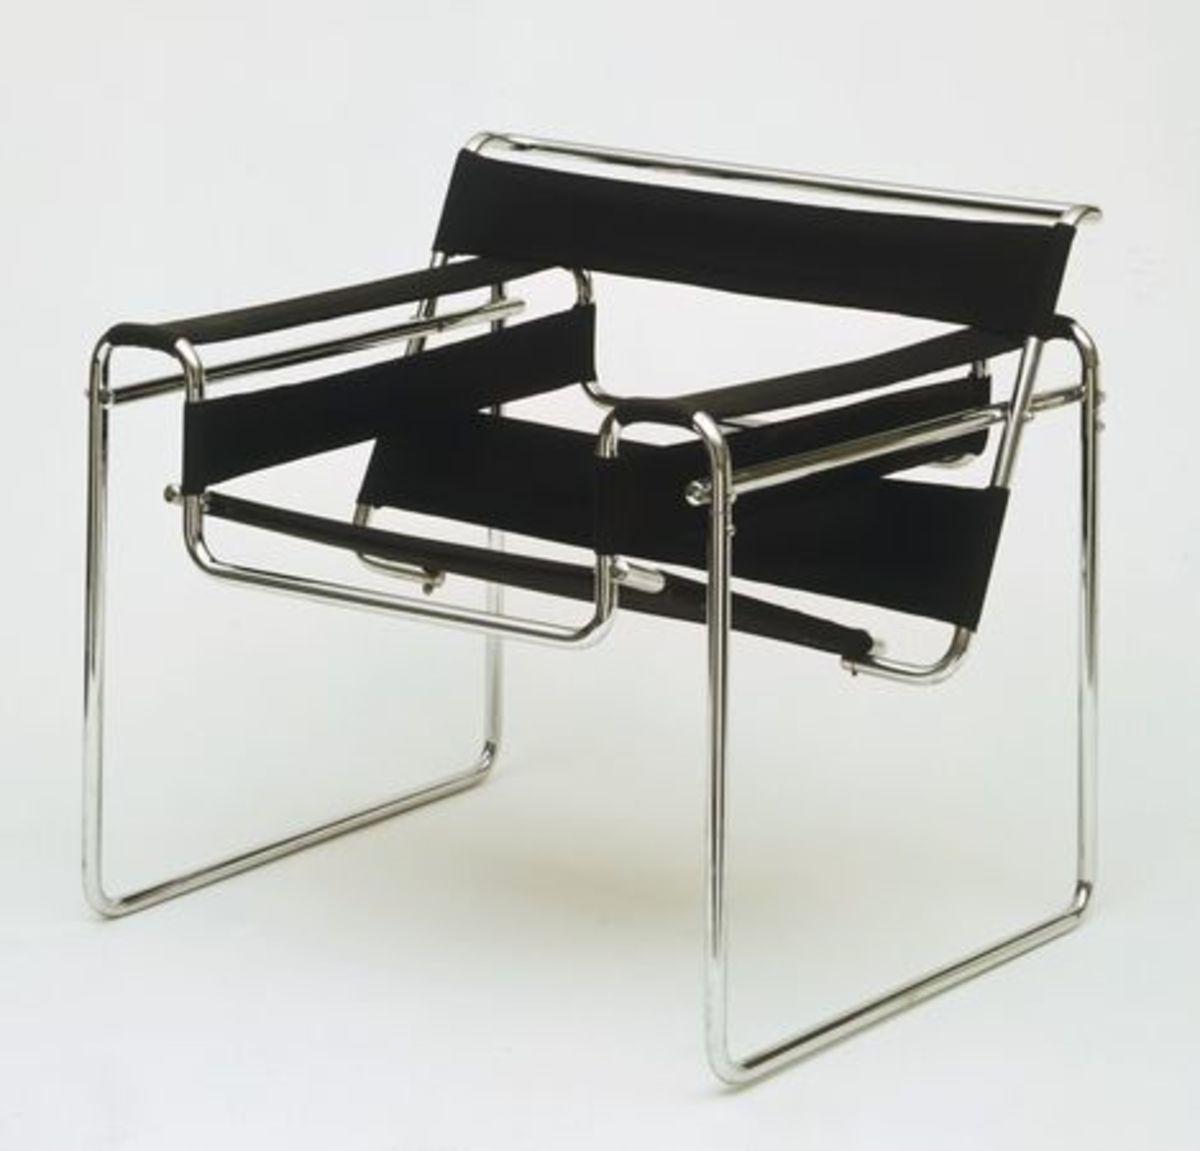 Bauhaus and Its Influence on Modern Design